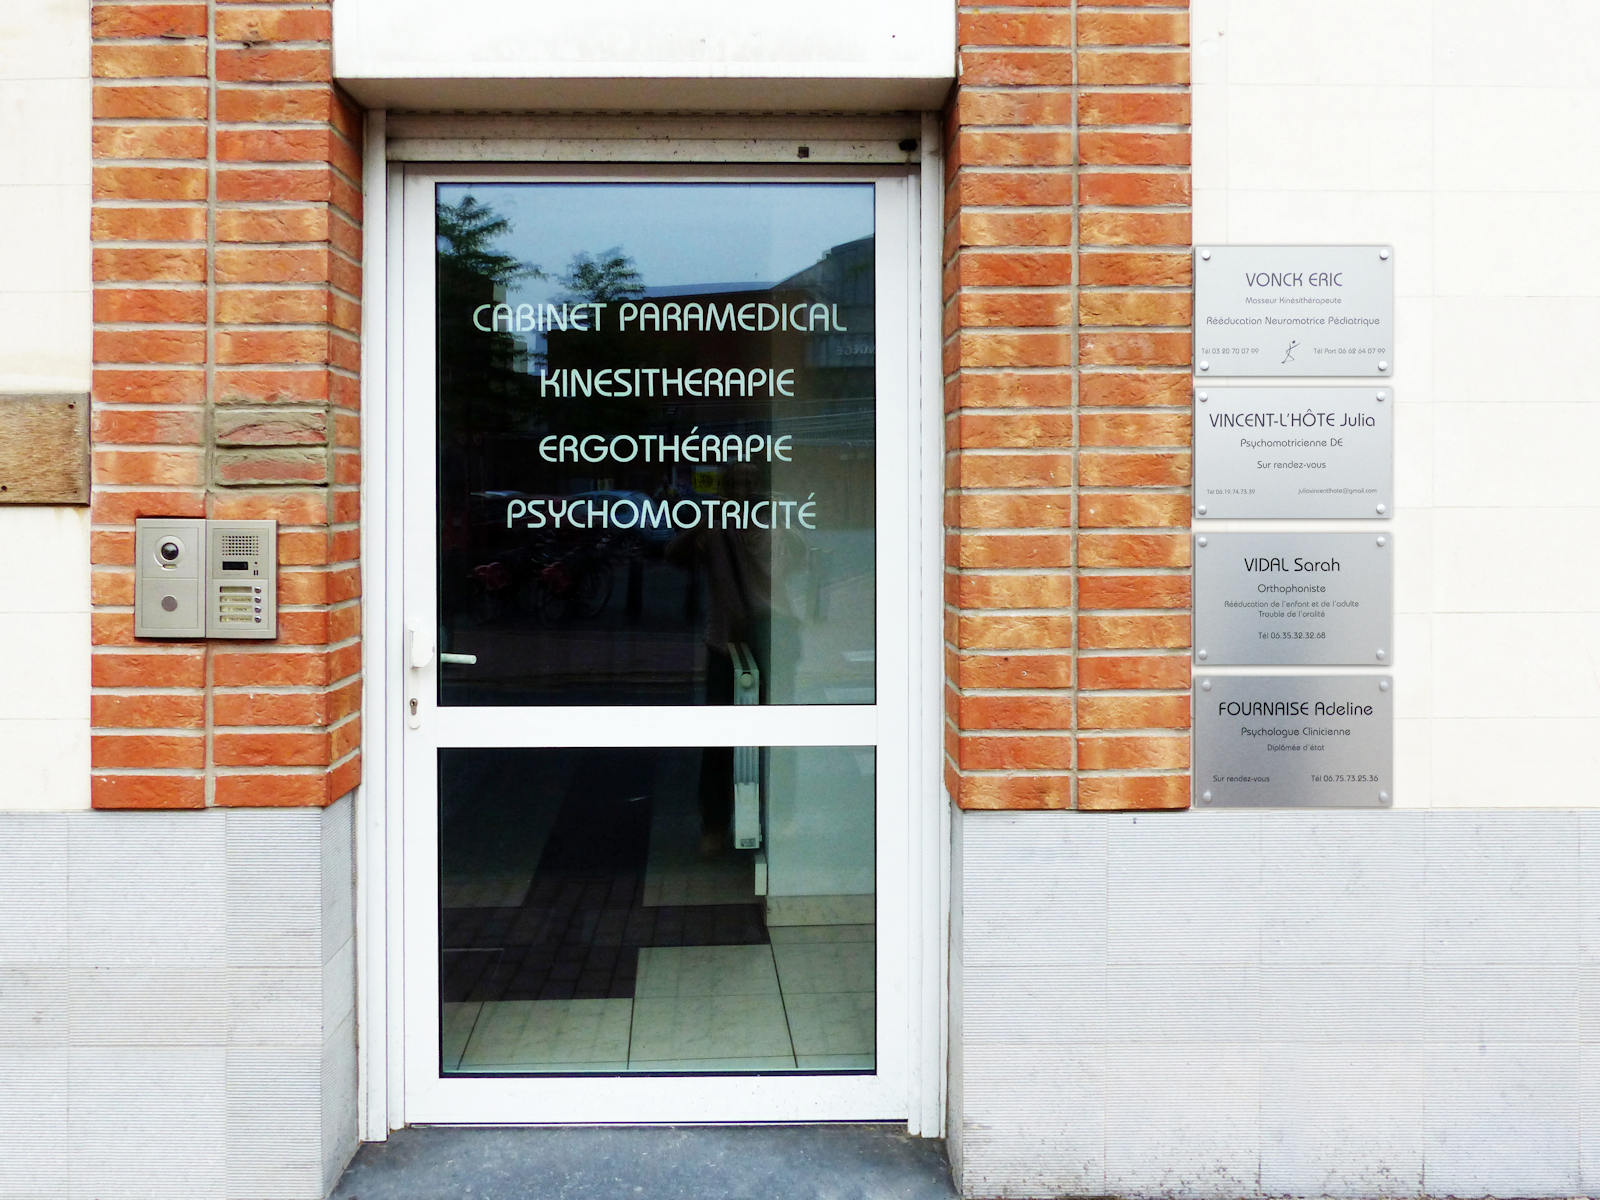 Cabinet Paramédical Centre Ville Tourcoing.